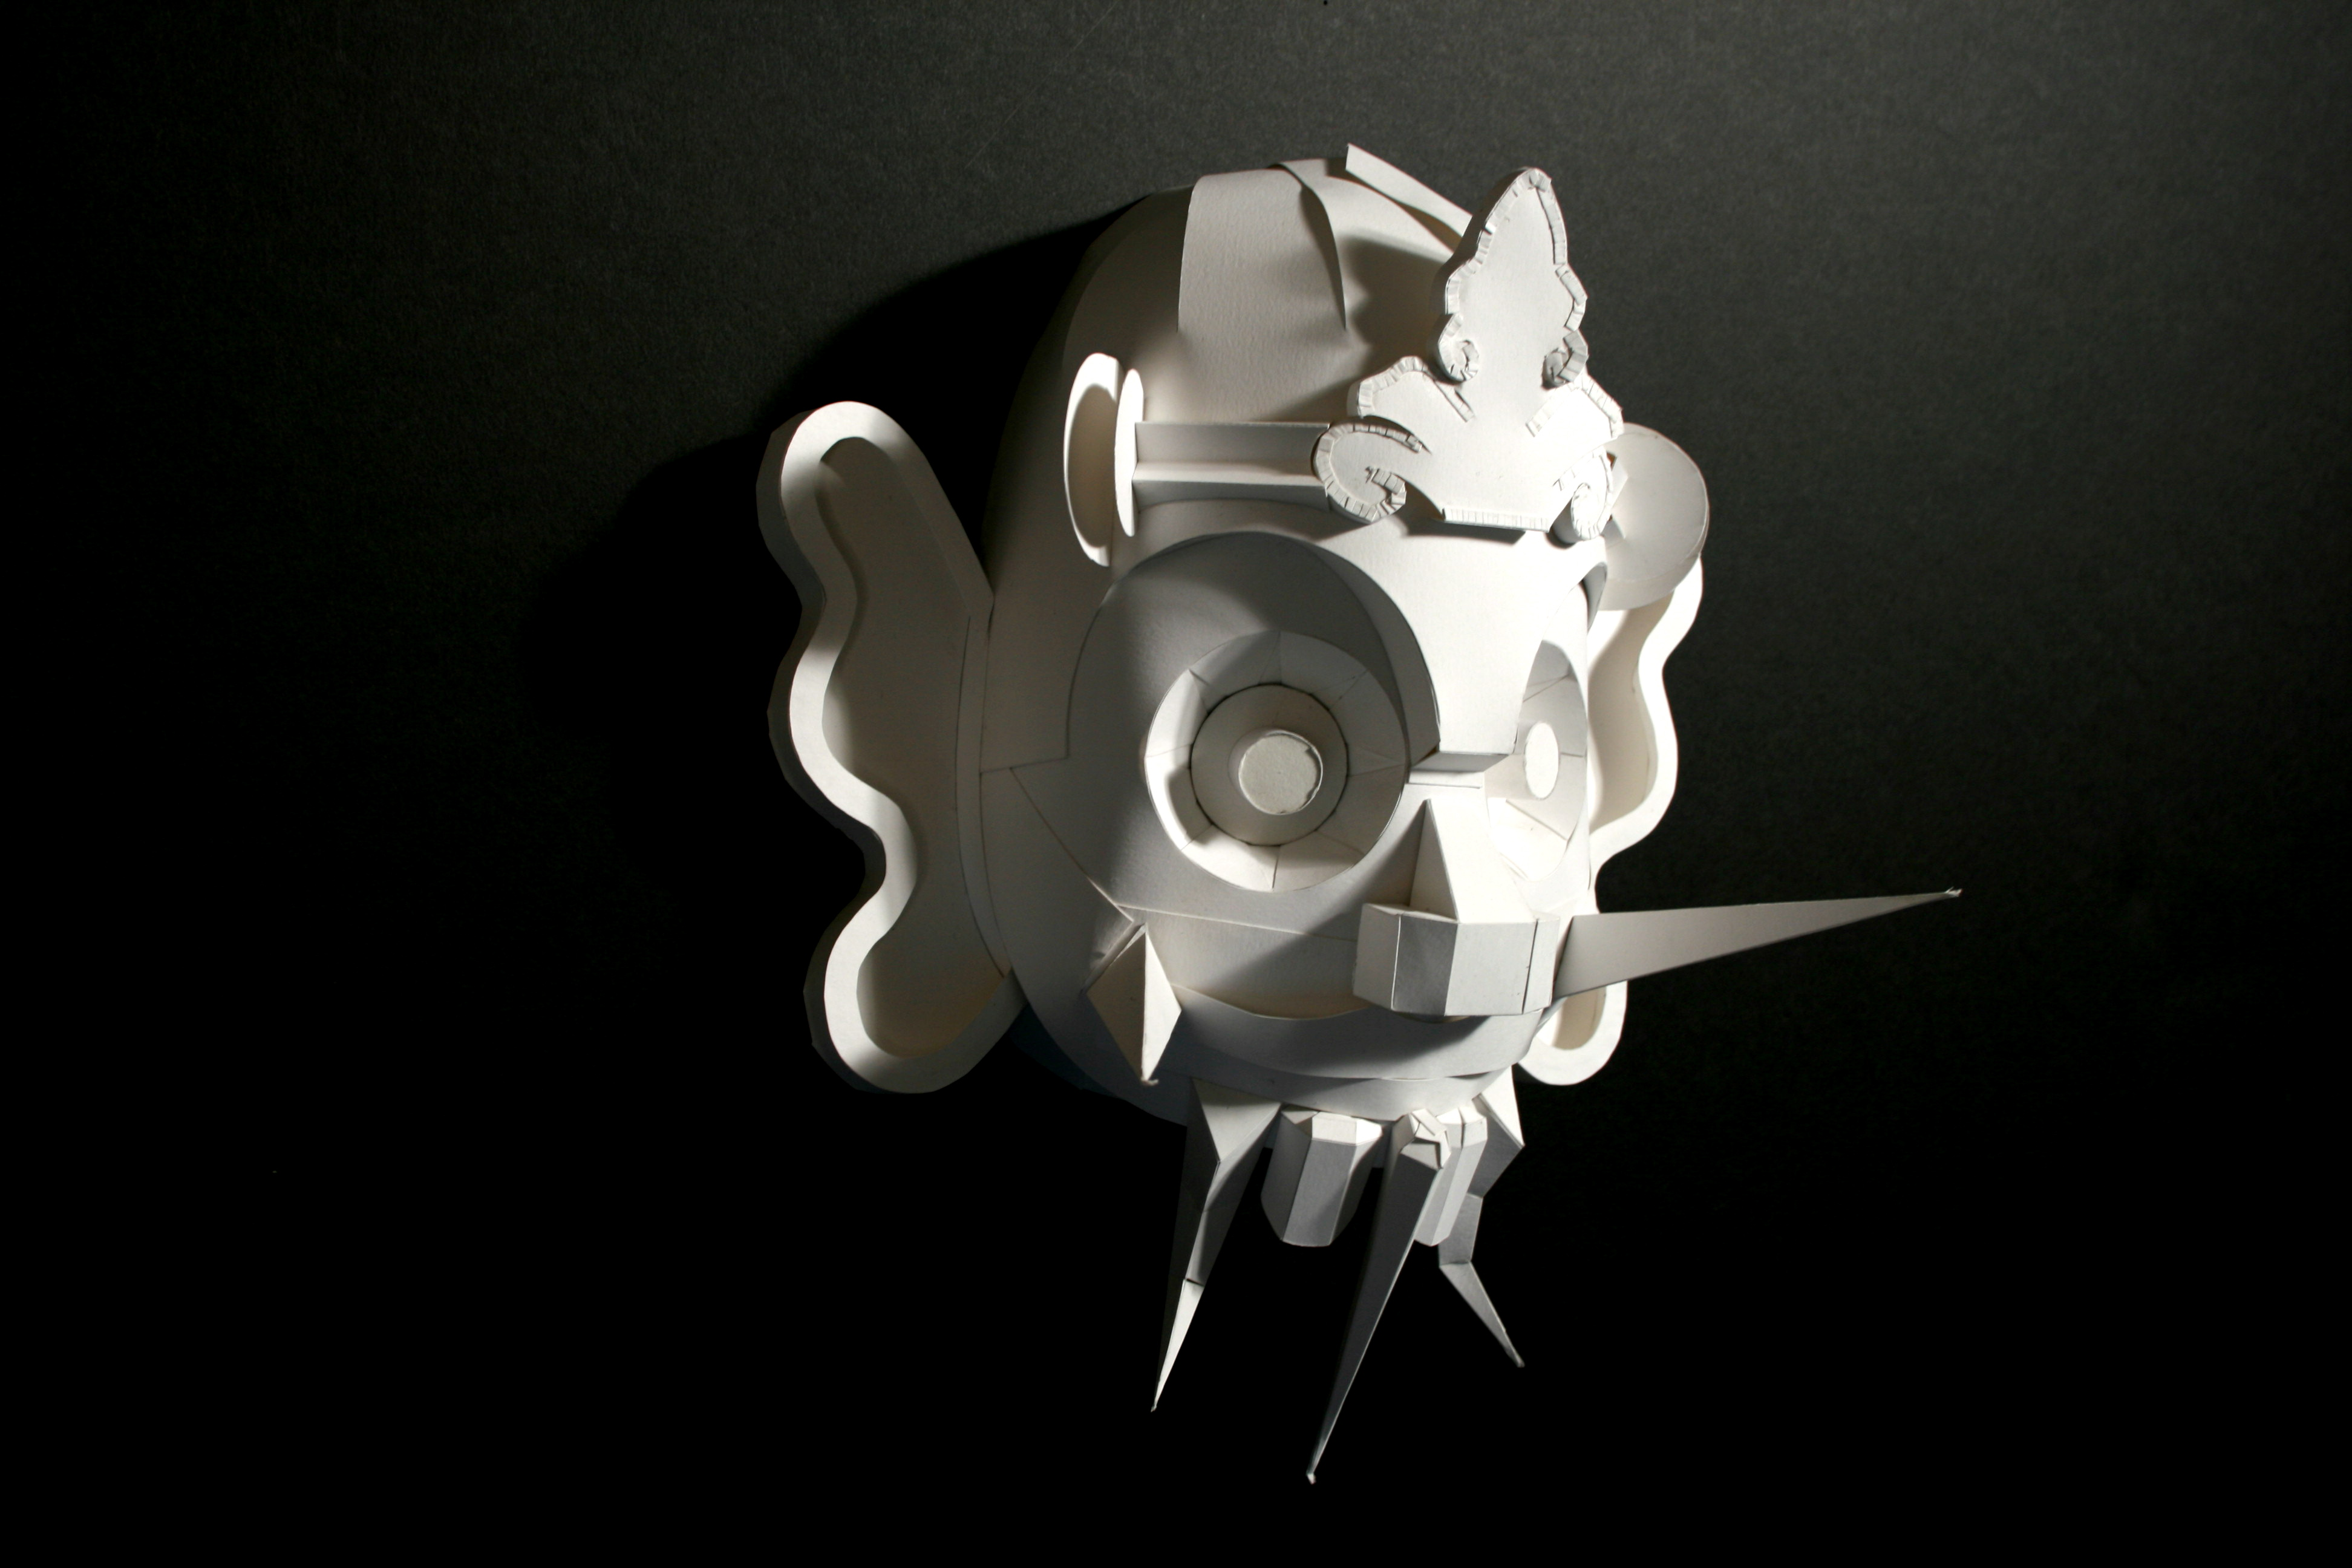 Basic 3d Design Studio